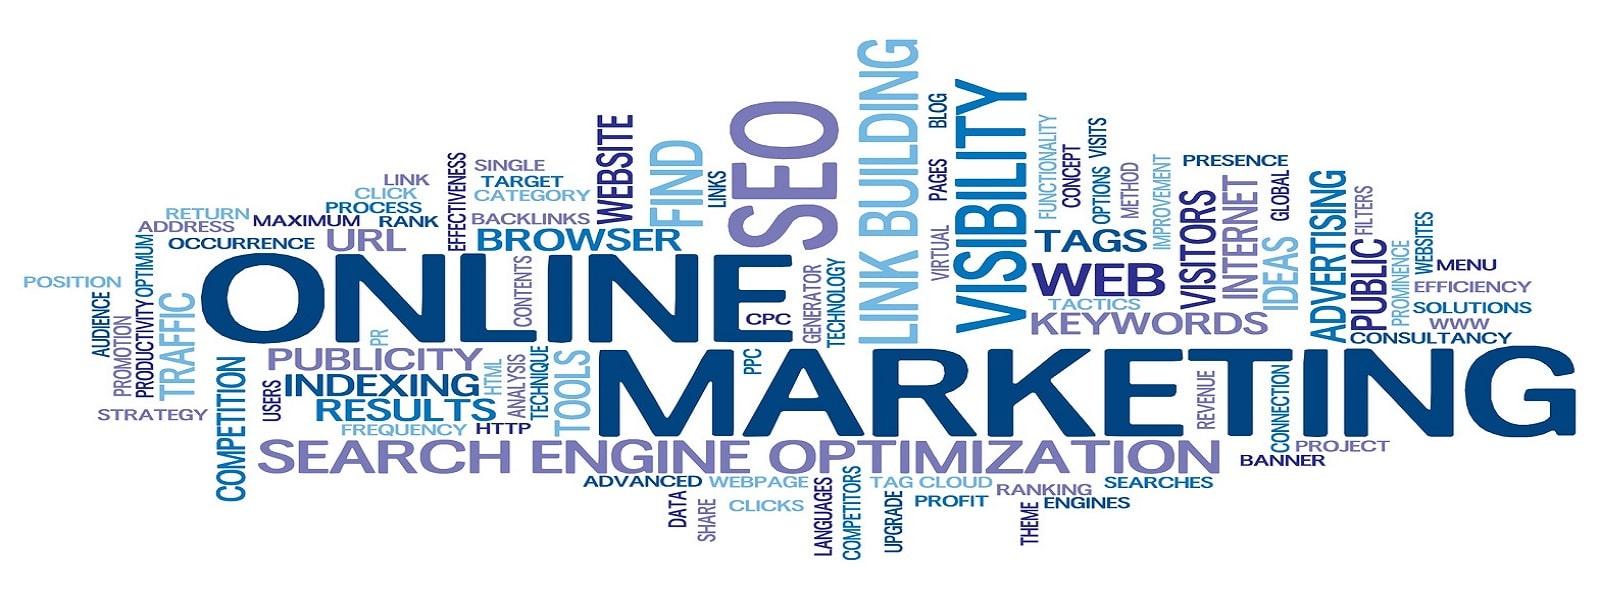 Online Marketing Deal